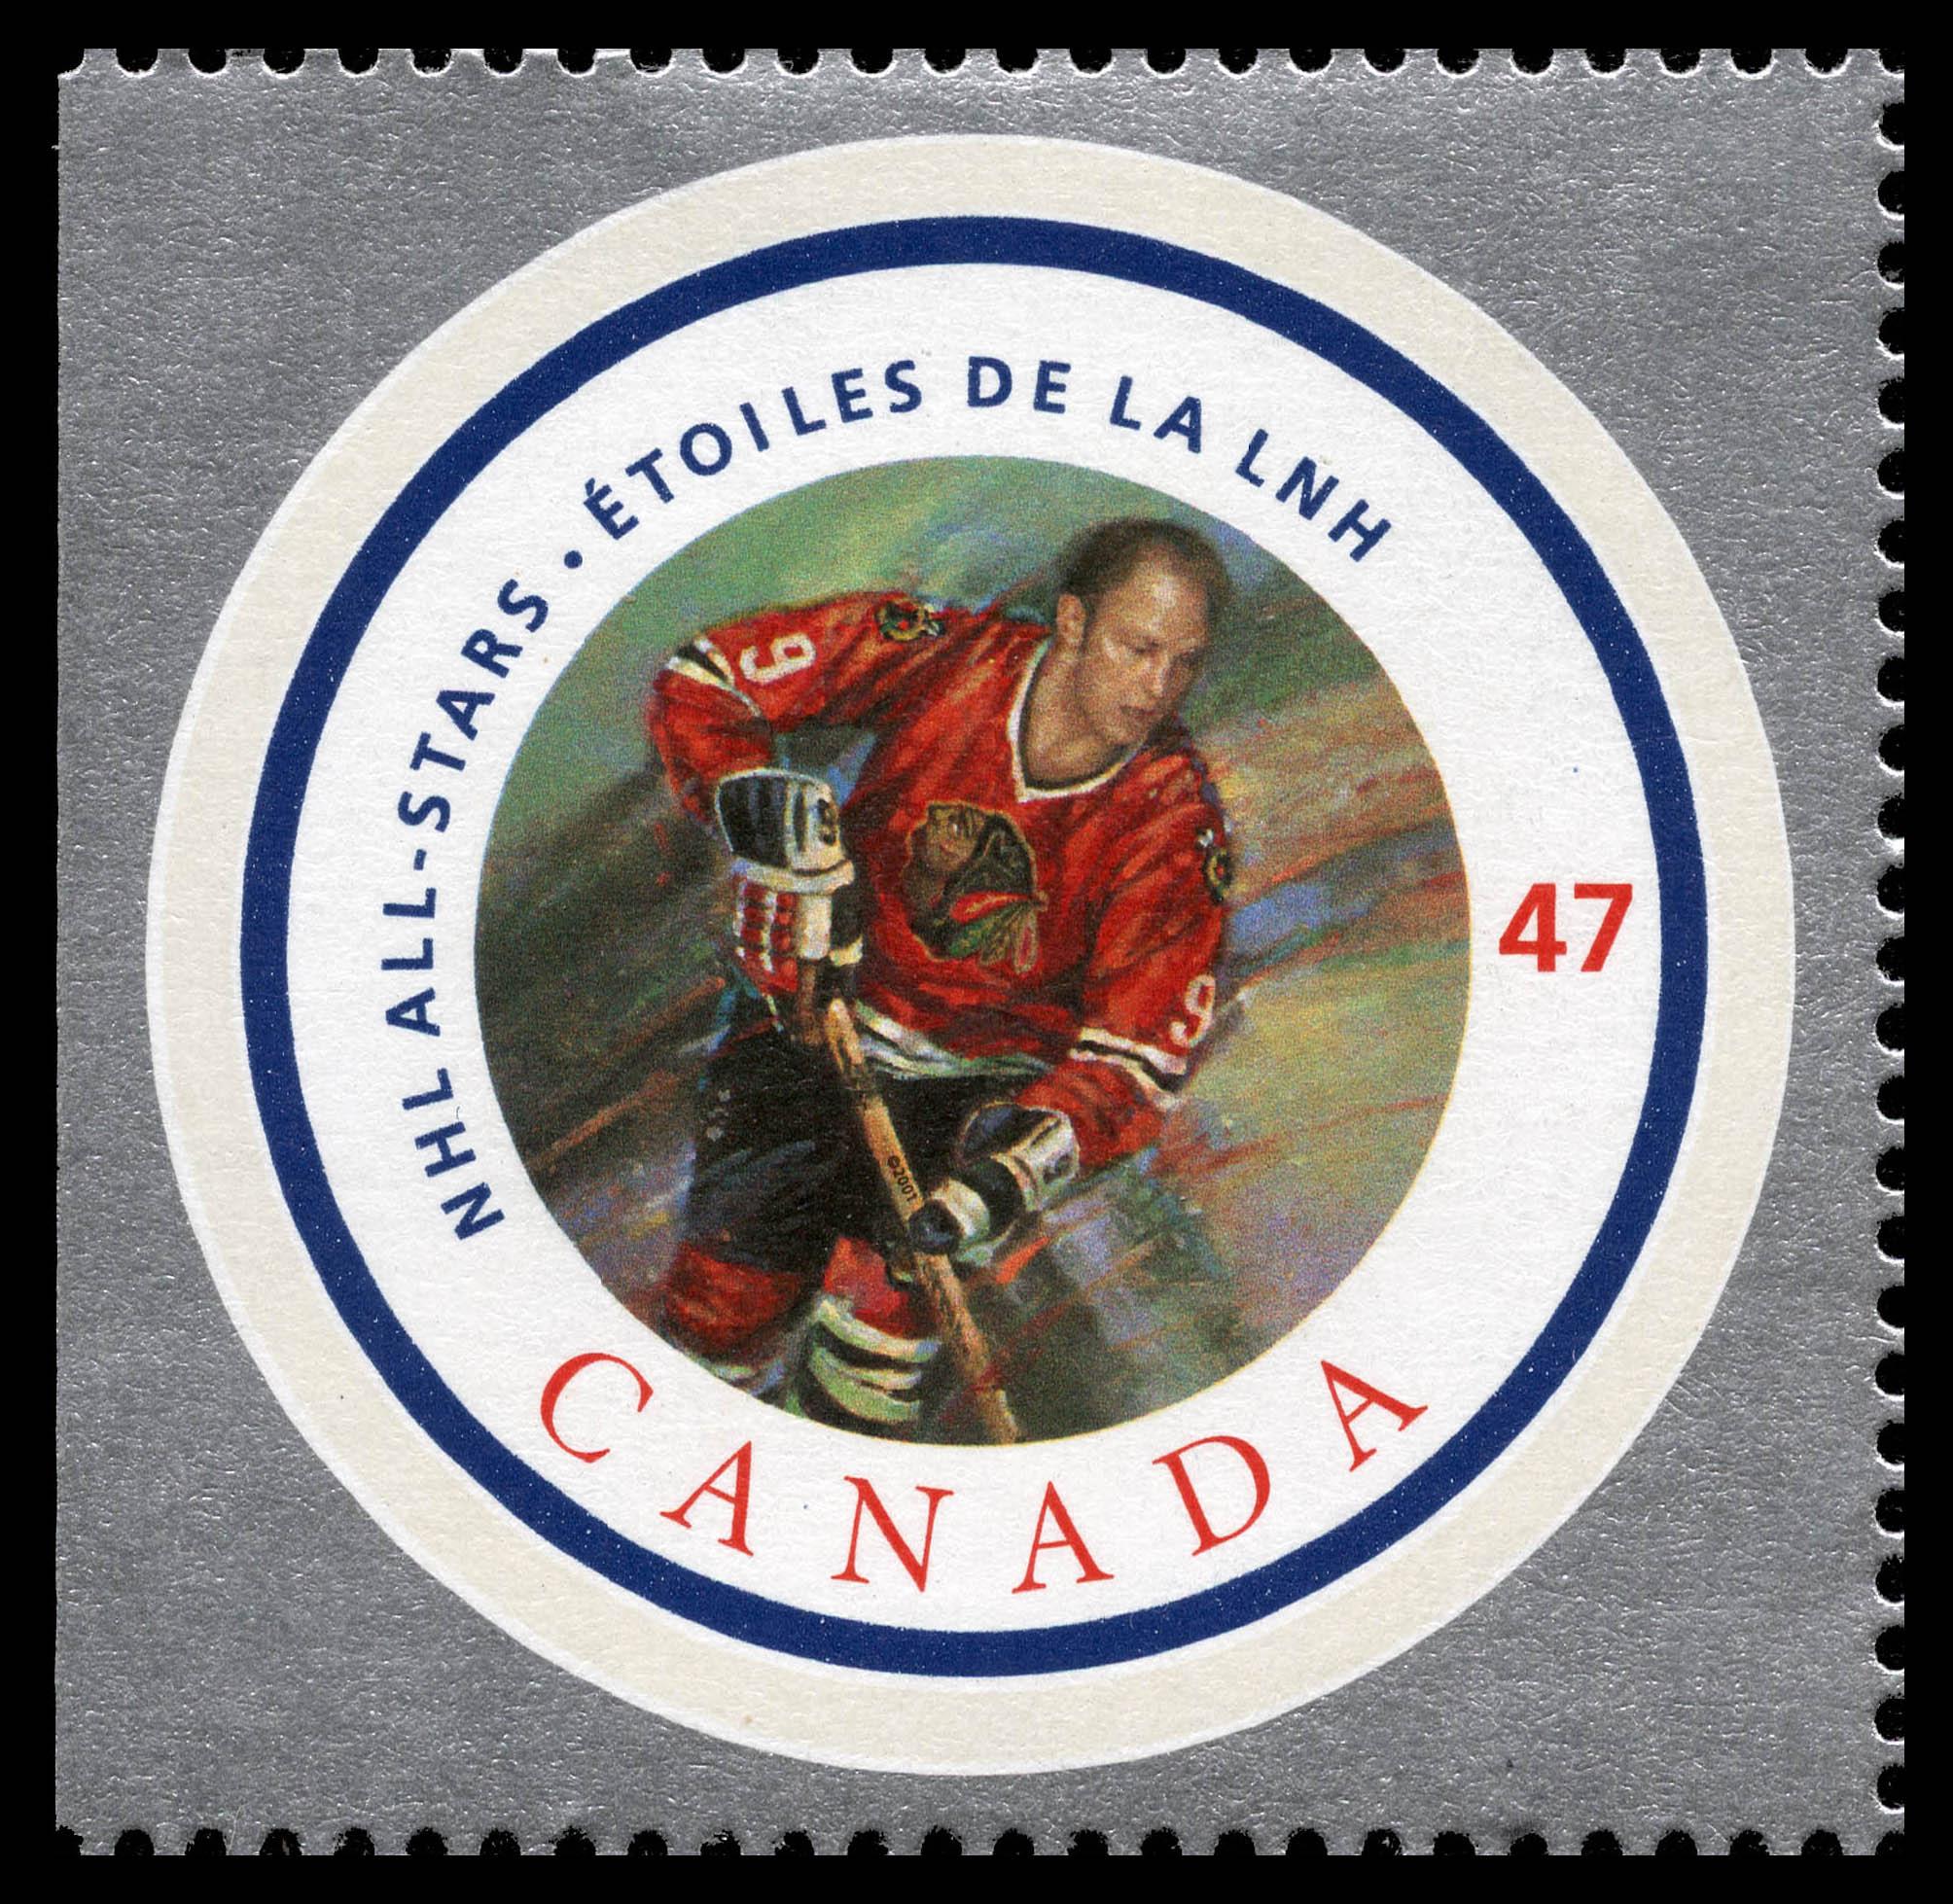 Bobby Hull Canada Postage Stamp | NHL All-Stars